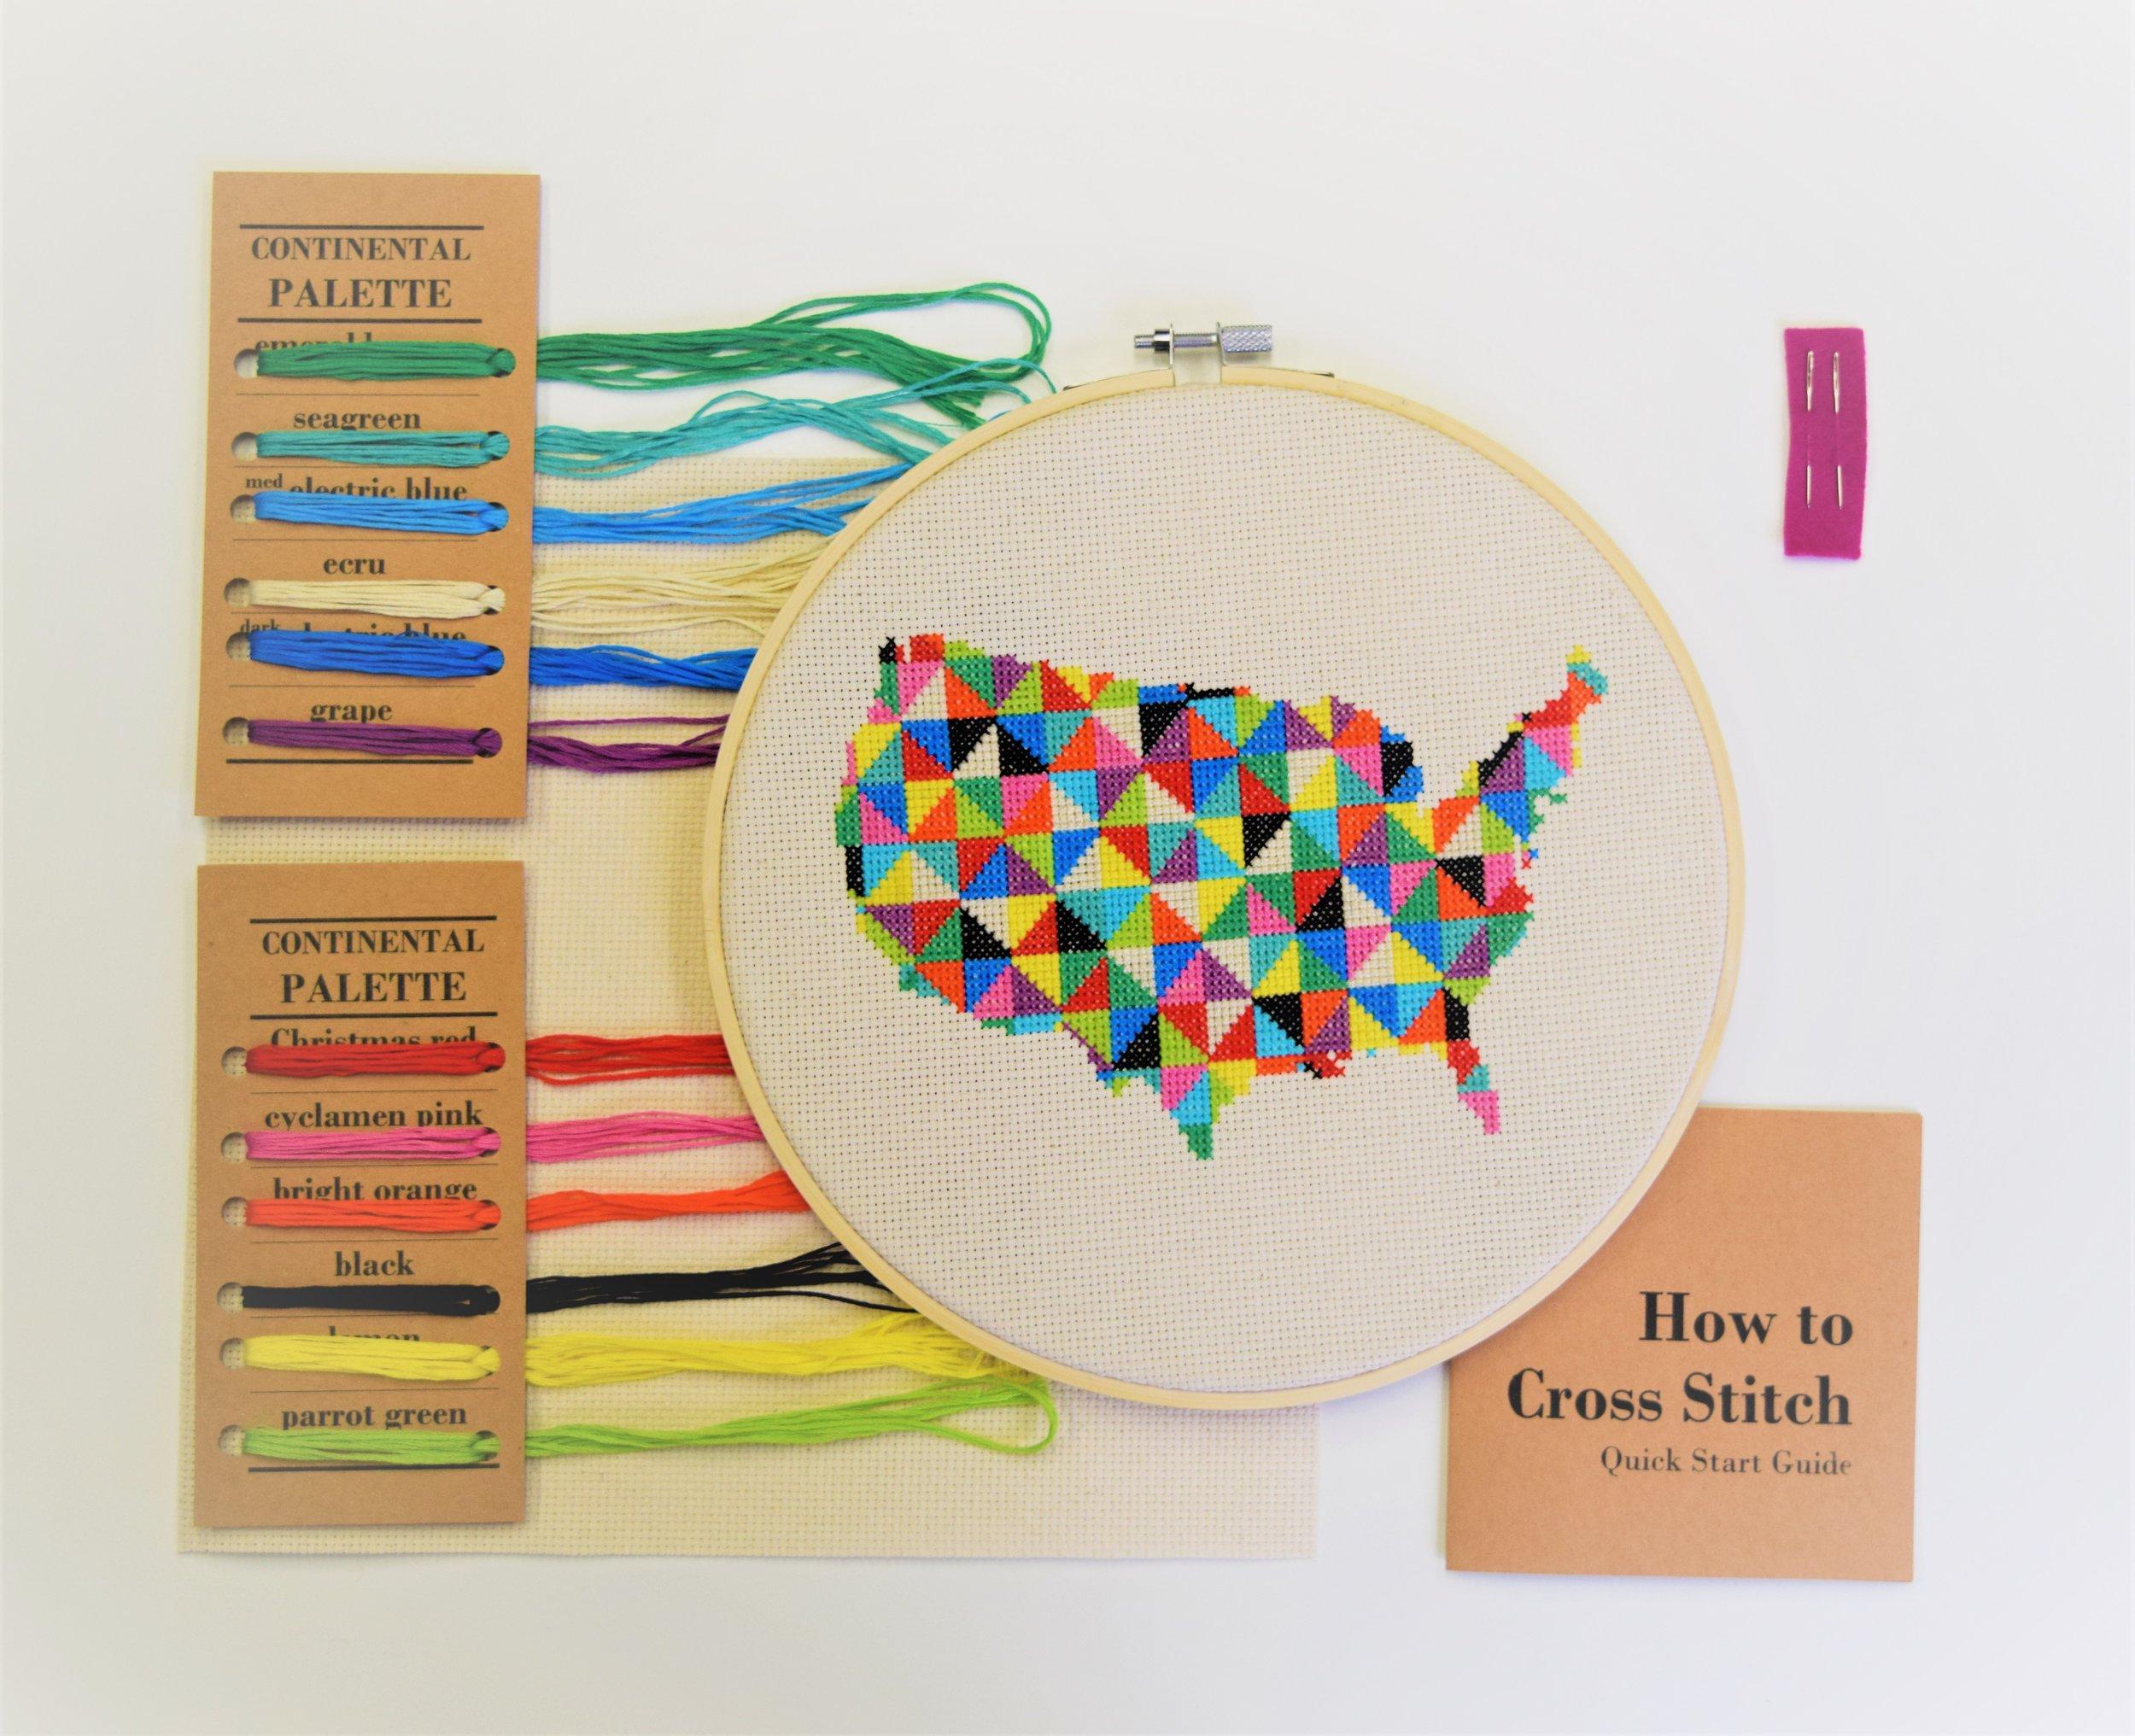 Cross Stitch Kit Contents